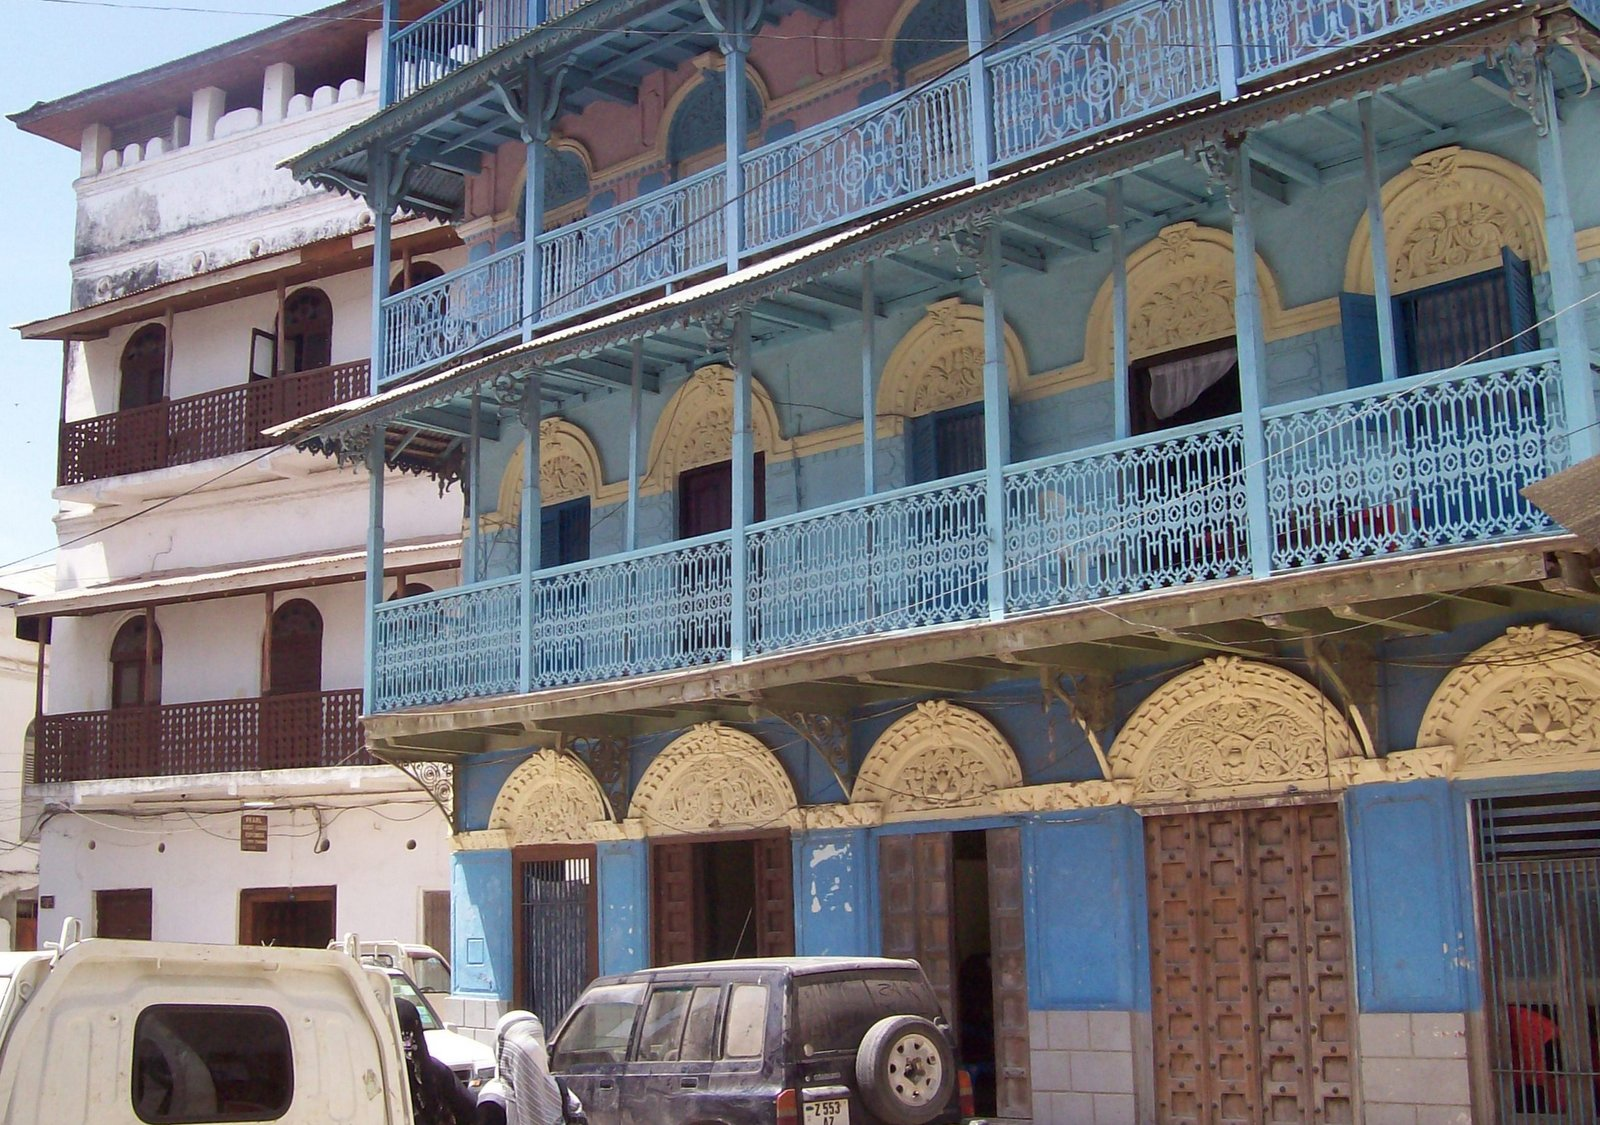 Haus der Prinzessin Selma in Stone Town